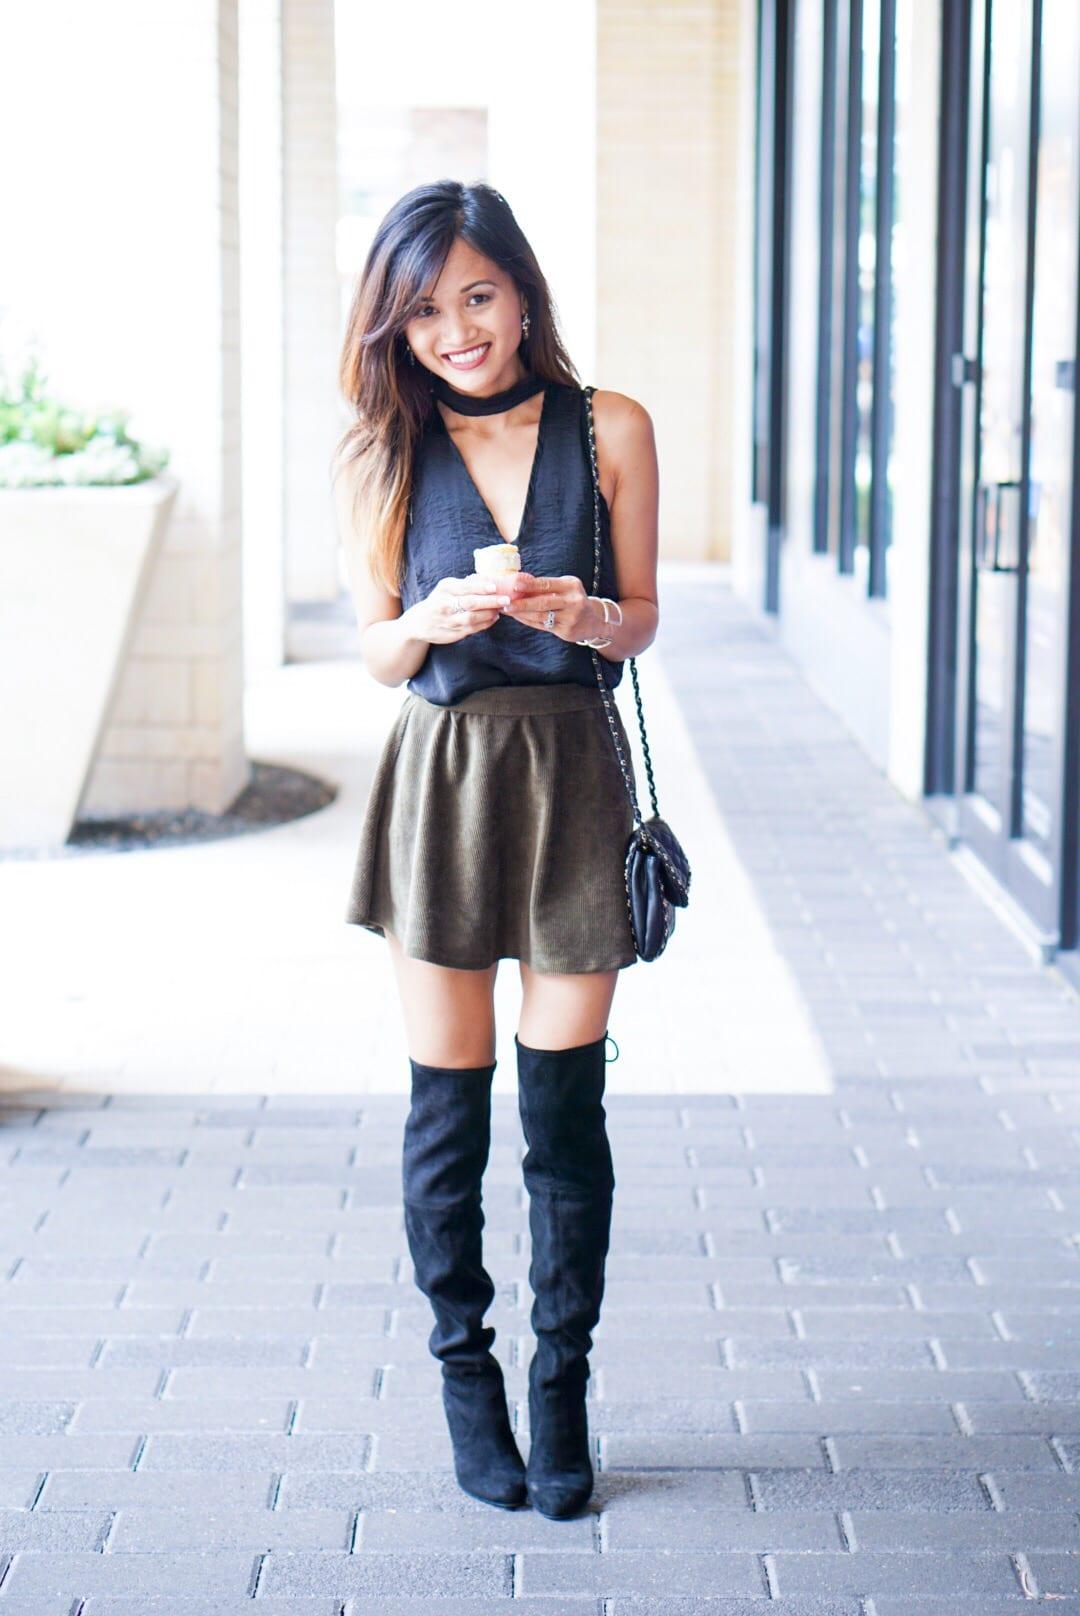 Mock Necks and Mini Skirts